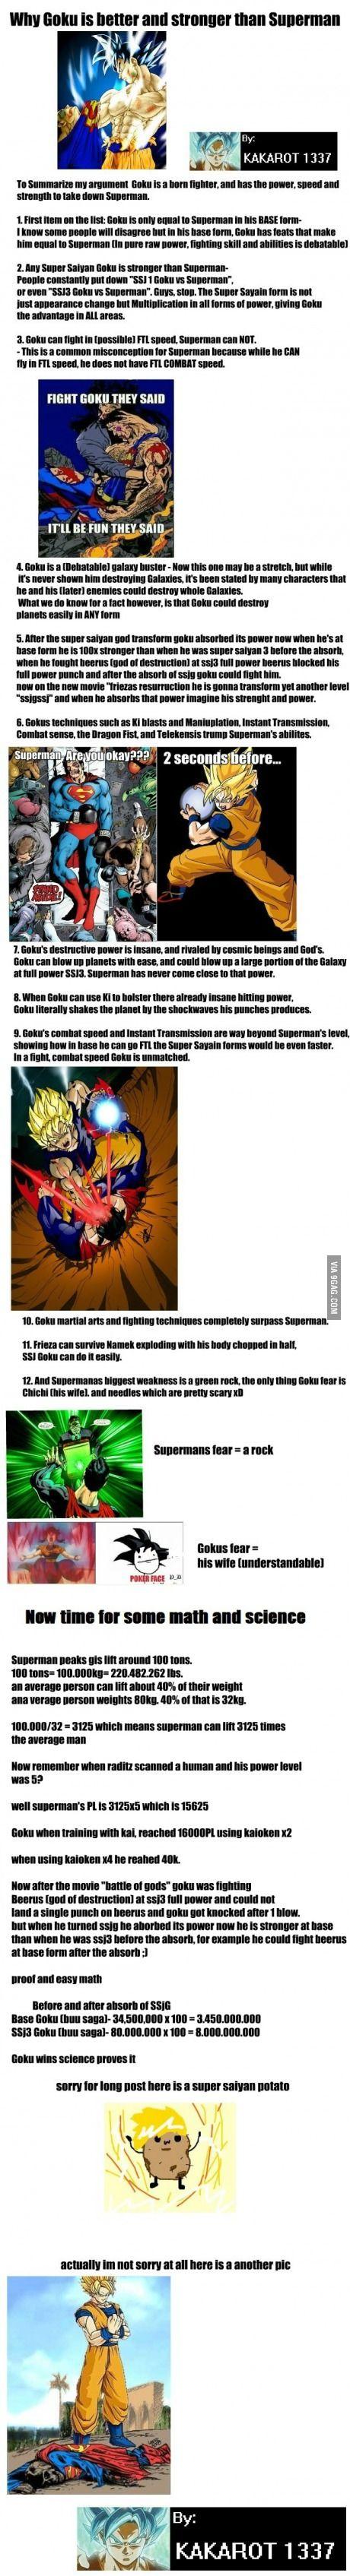 Goku Vs Superman The Truth That Hurts Dc Fanboys Goku Vs Goku Goku Vs Superman